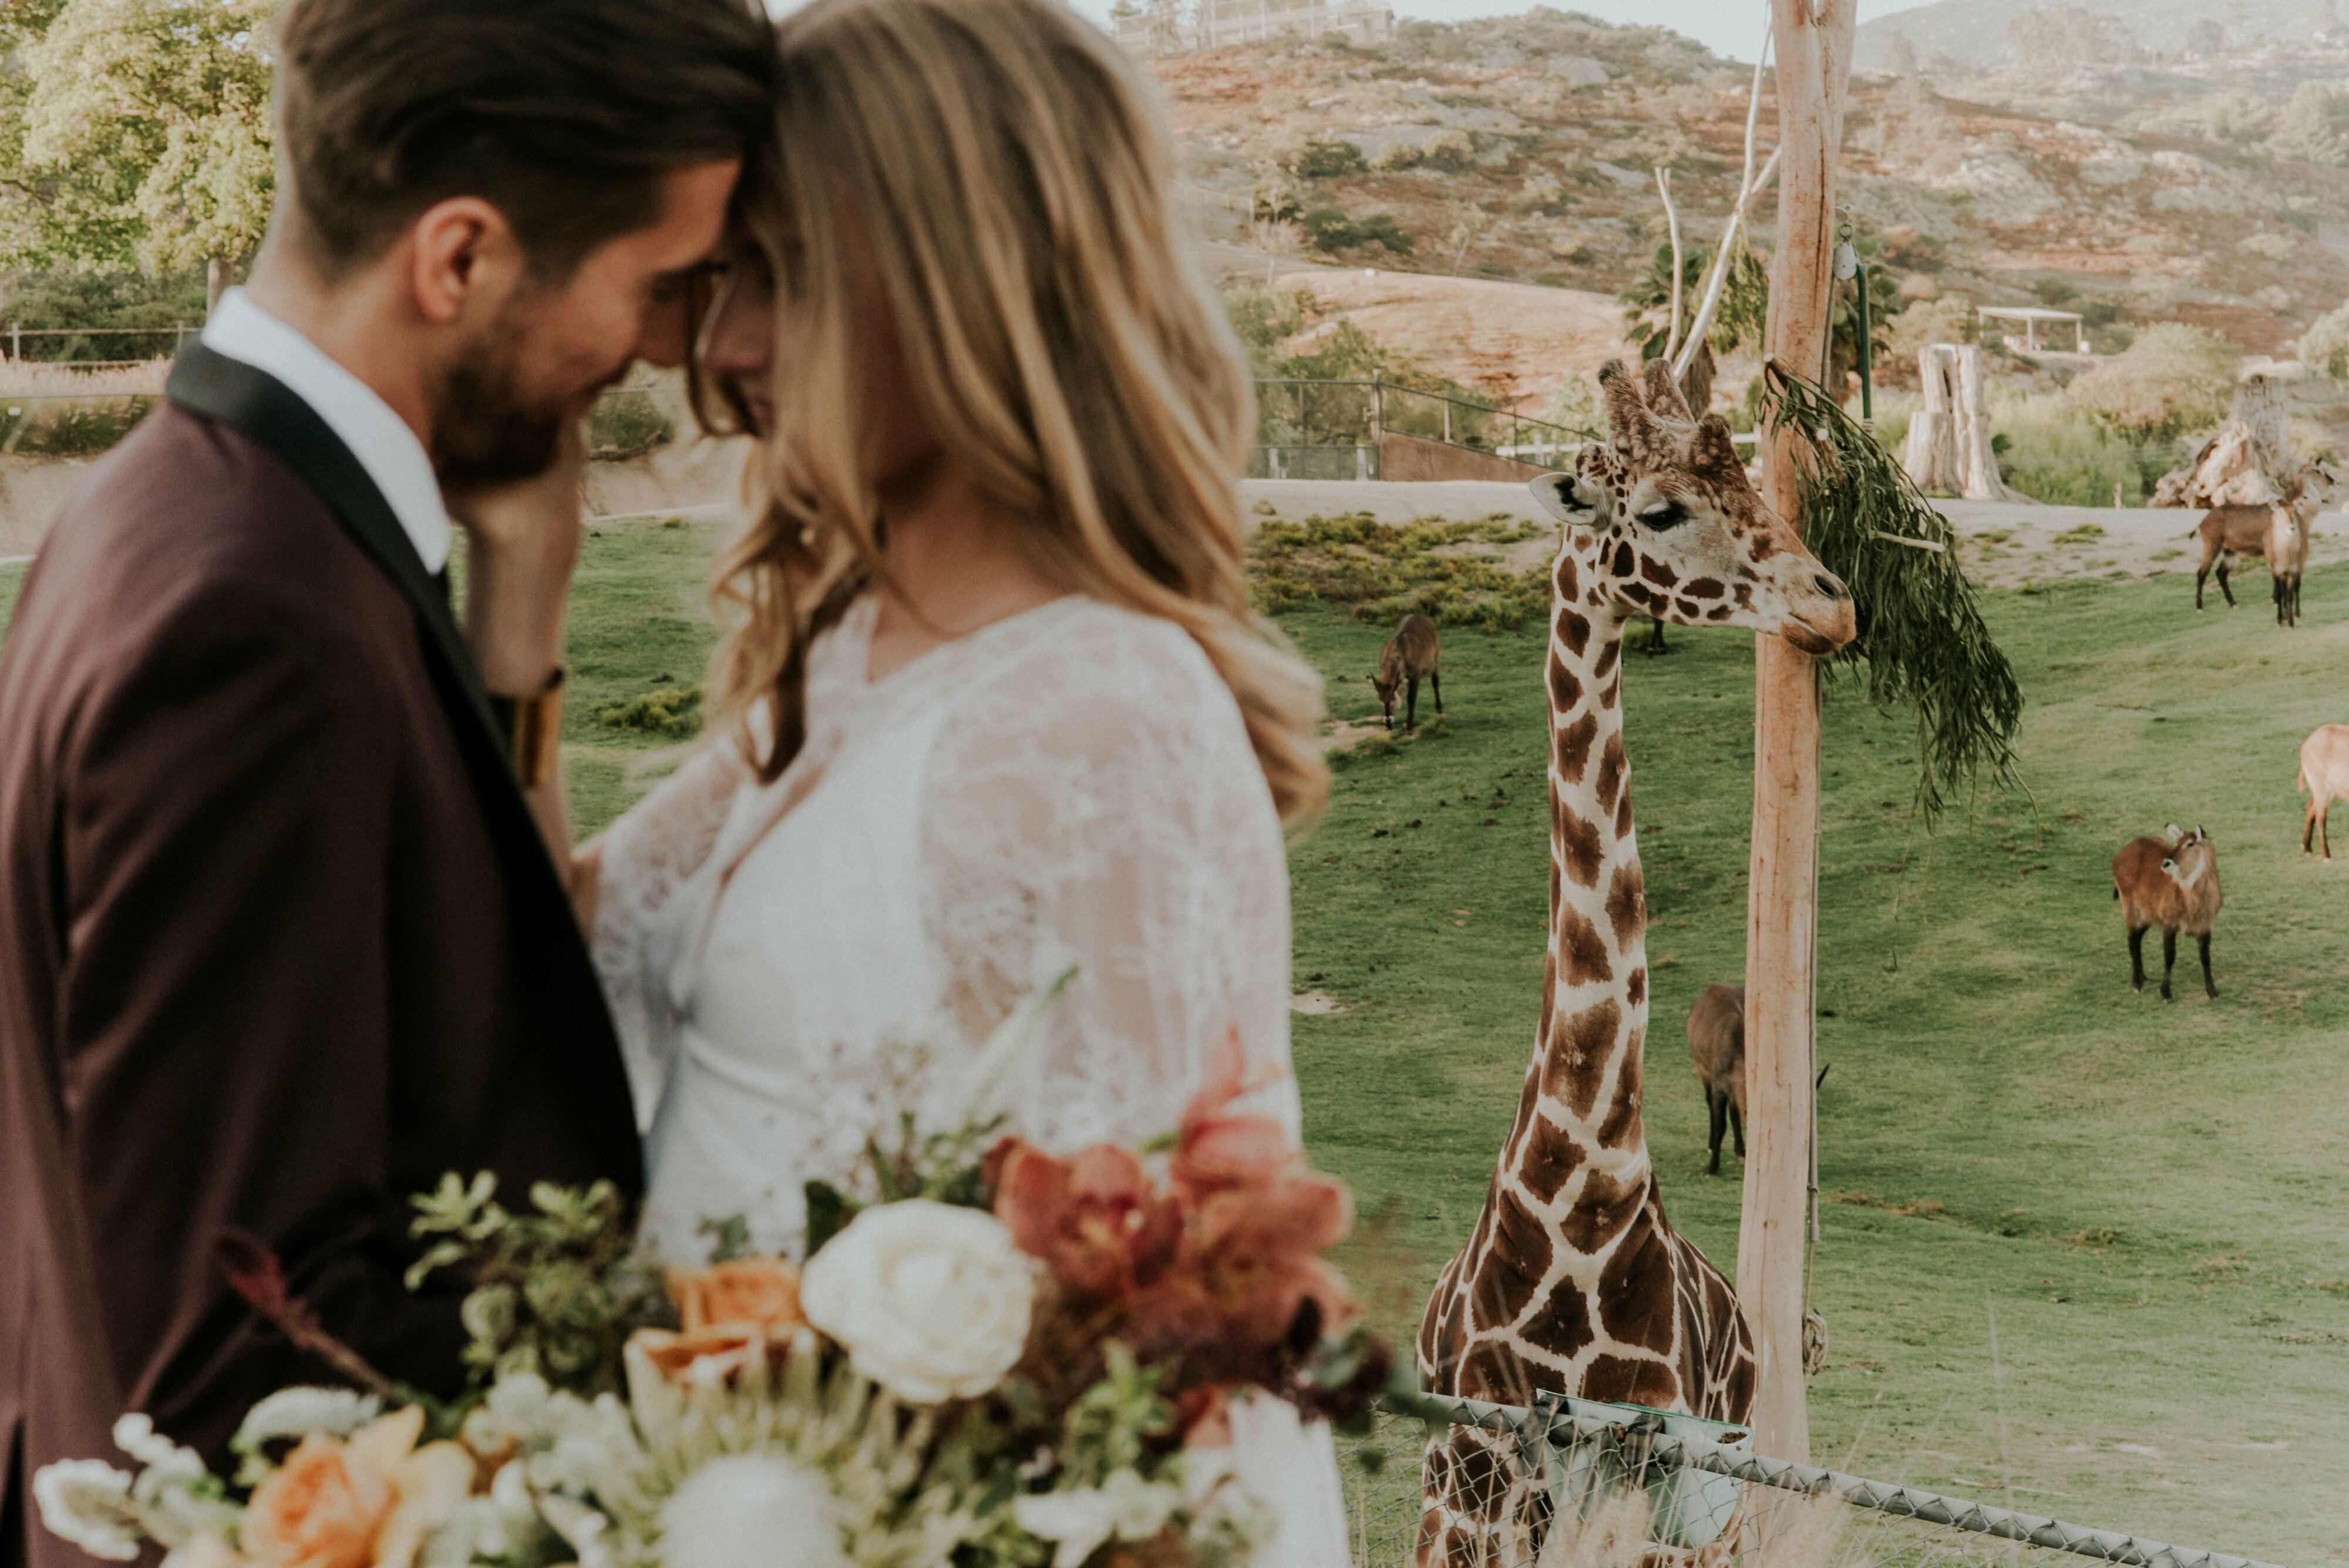 Wedding Reception Venues In Julian Ca The Knot